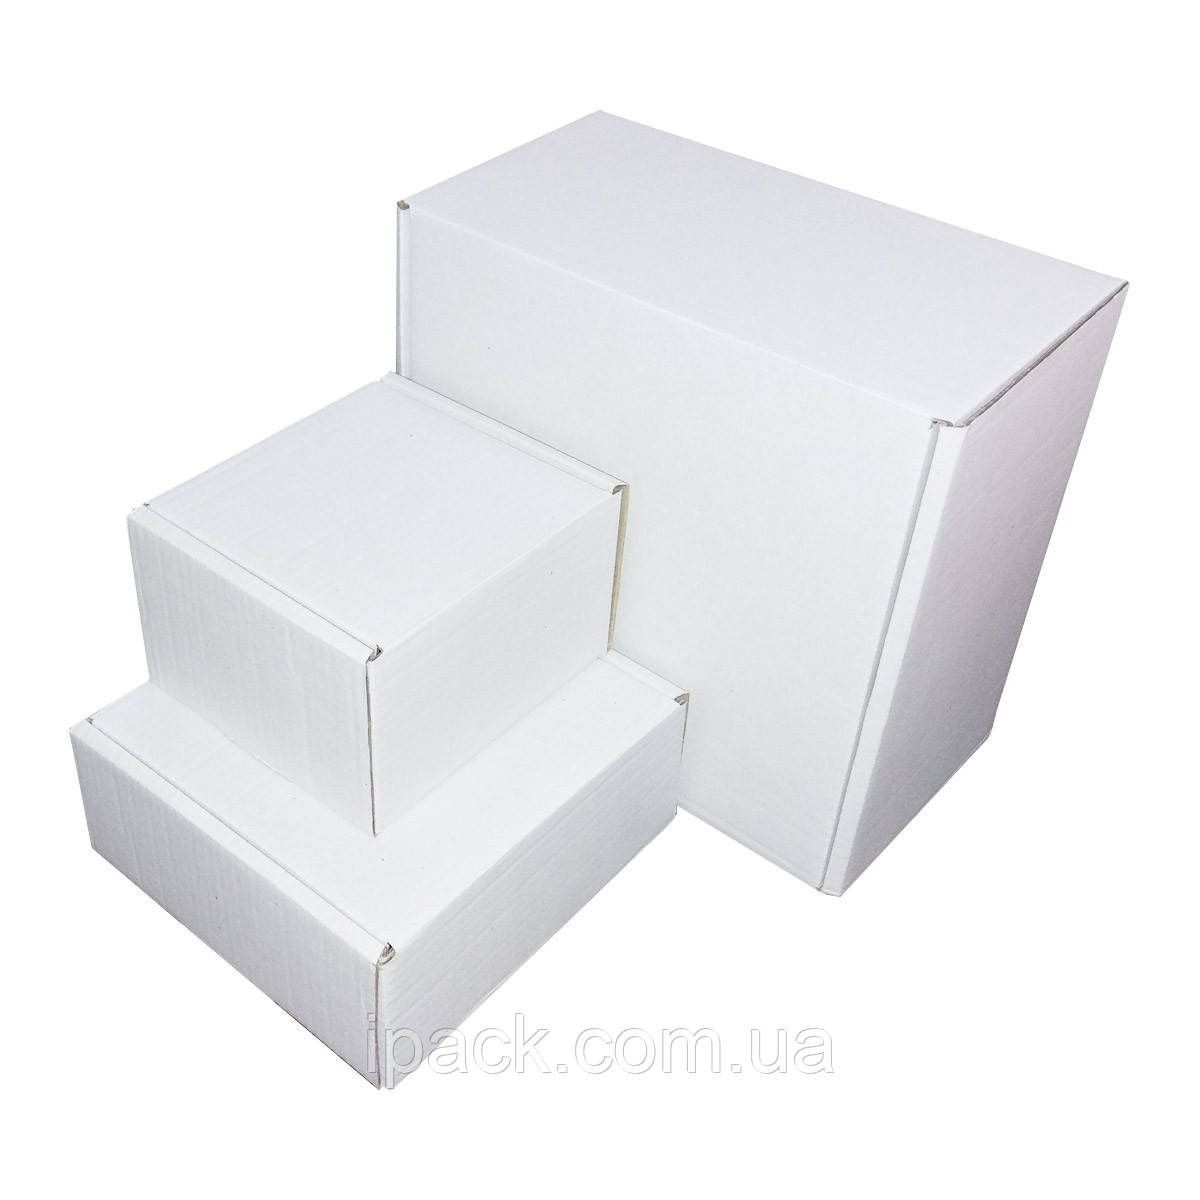 Коробка картонная самосборная, 170*170*55, мм, белая, микрогофрокартон